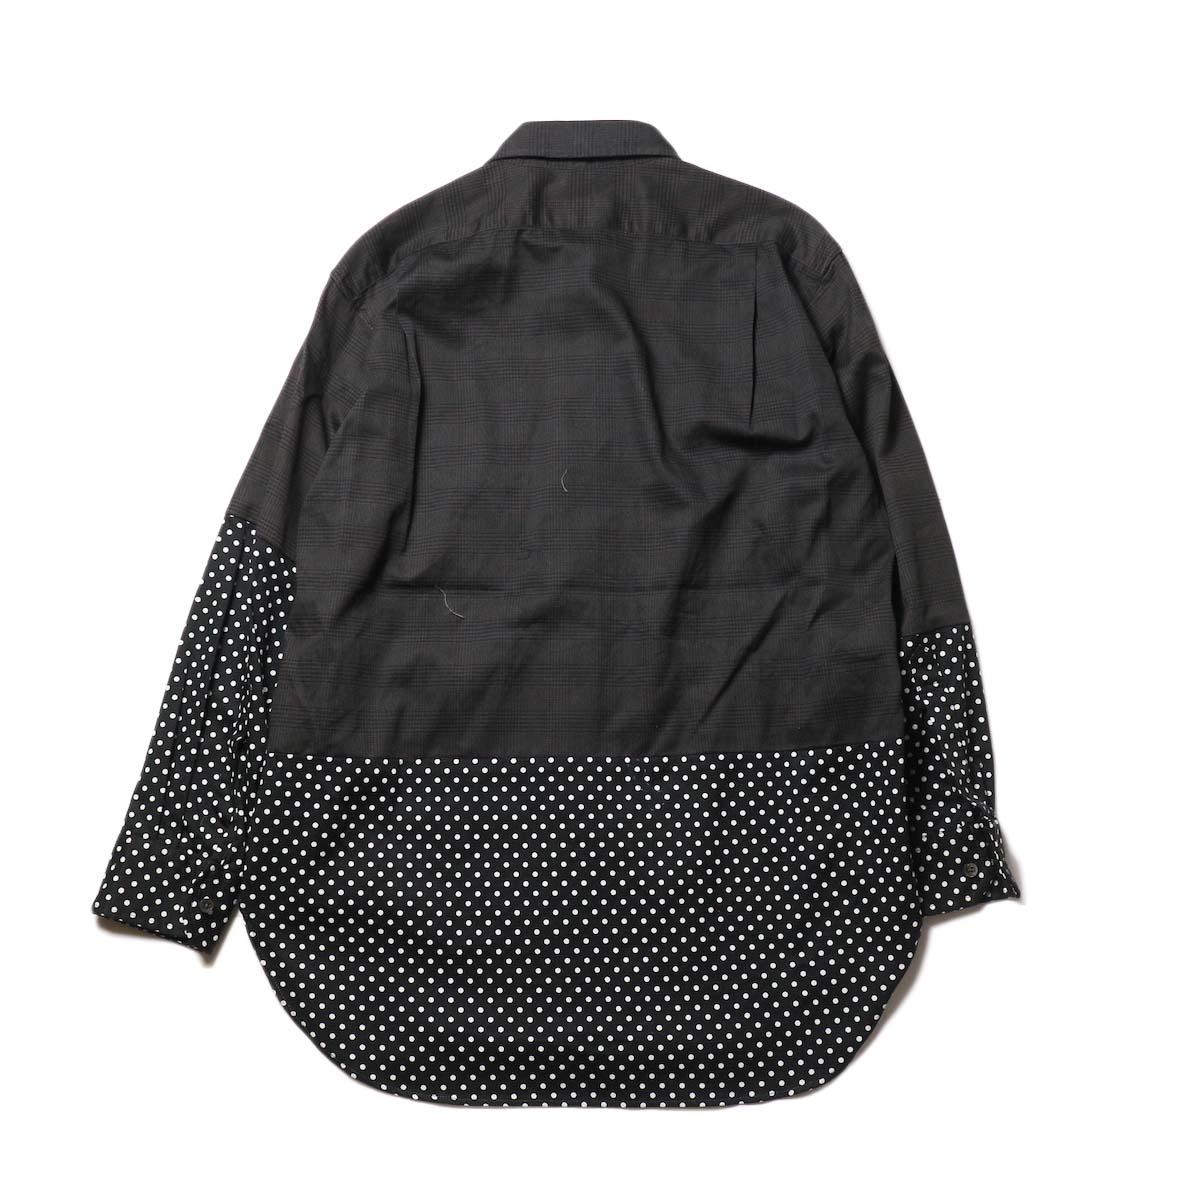 Engineered Garments / Spread Collar Shirt -Glen Plaid (Grey)背面